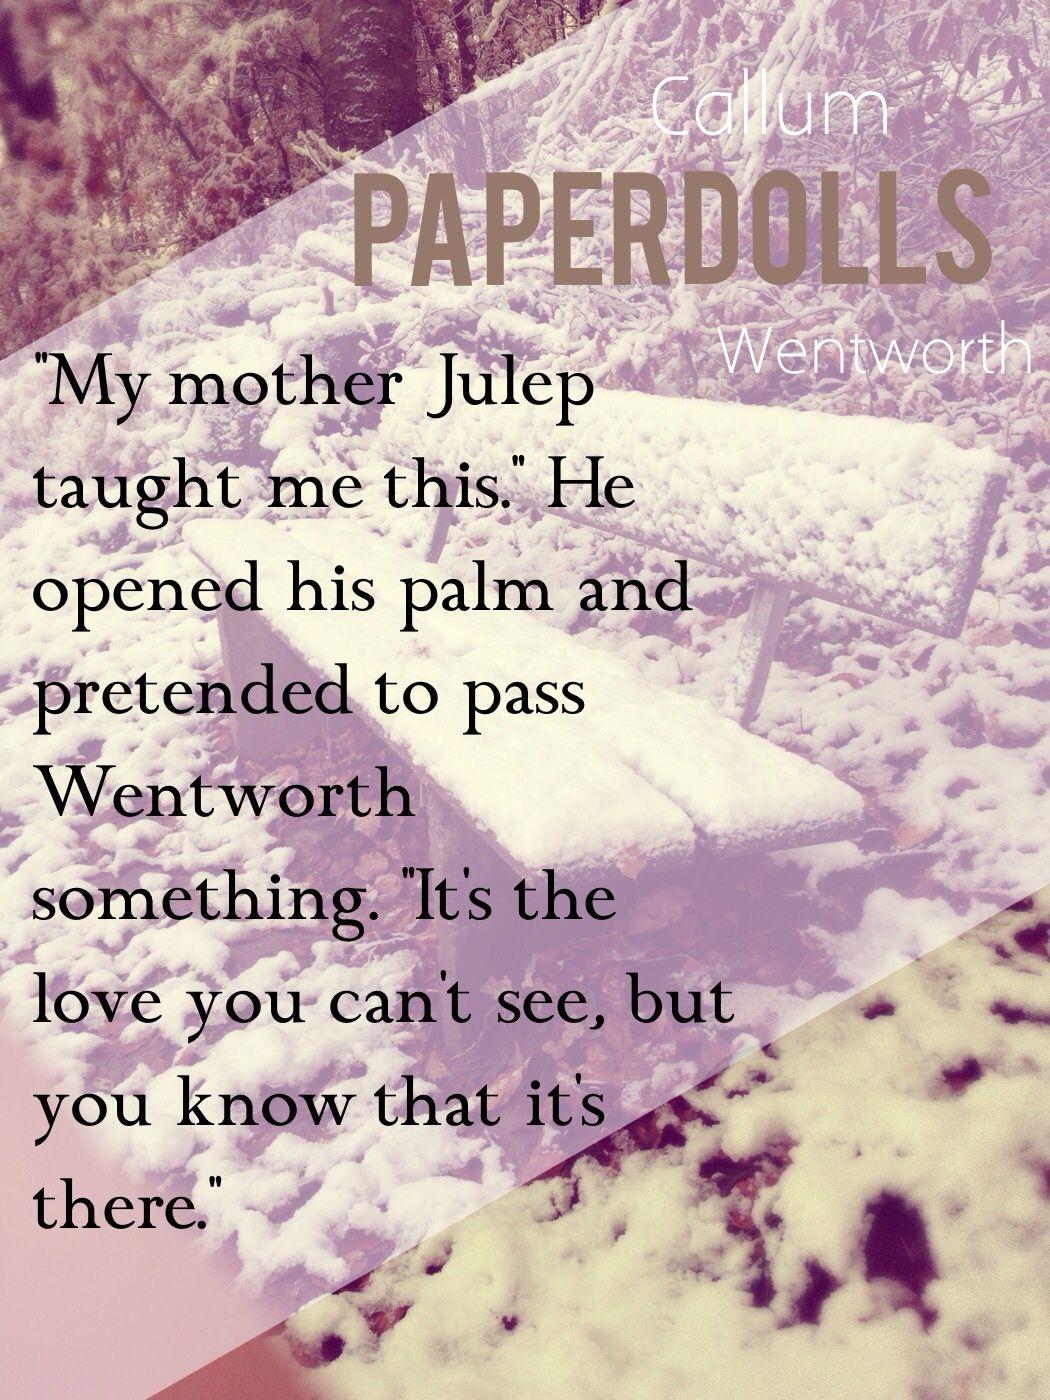 Quotes books novels goodreads literary romance love